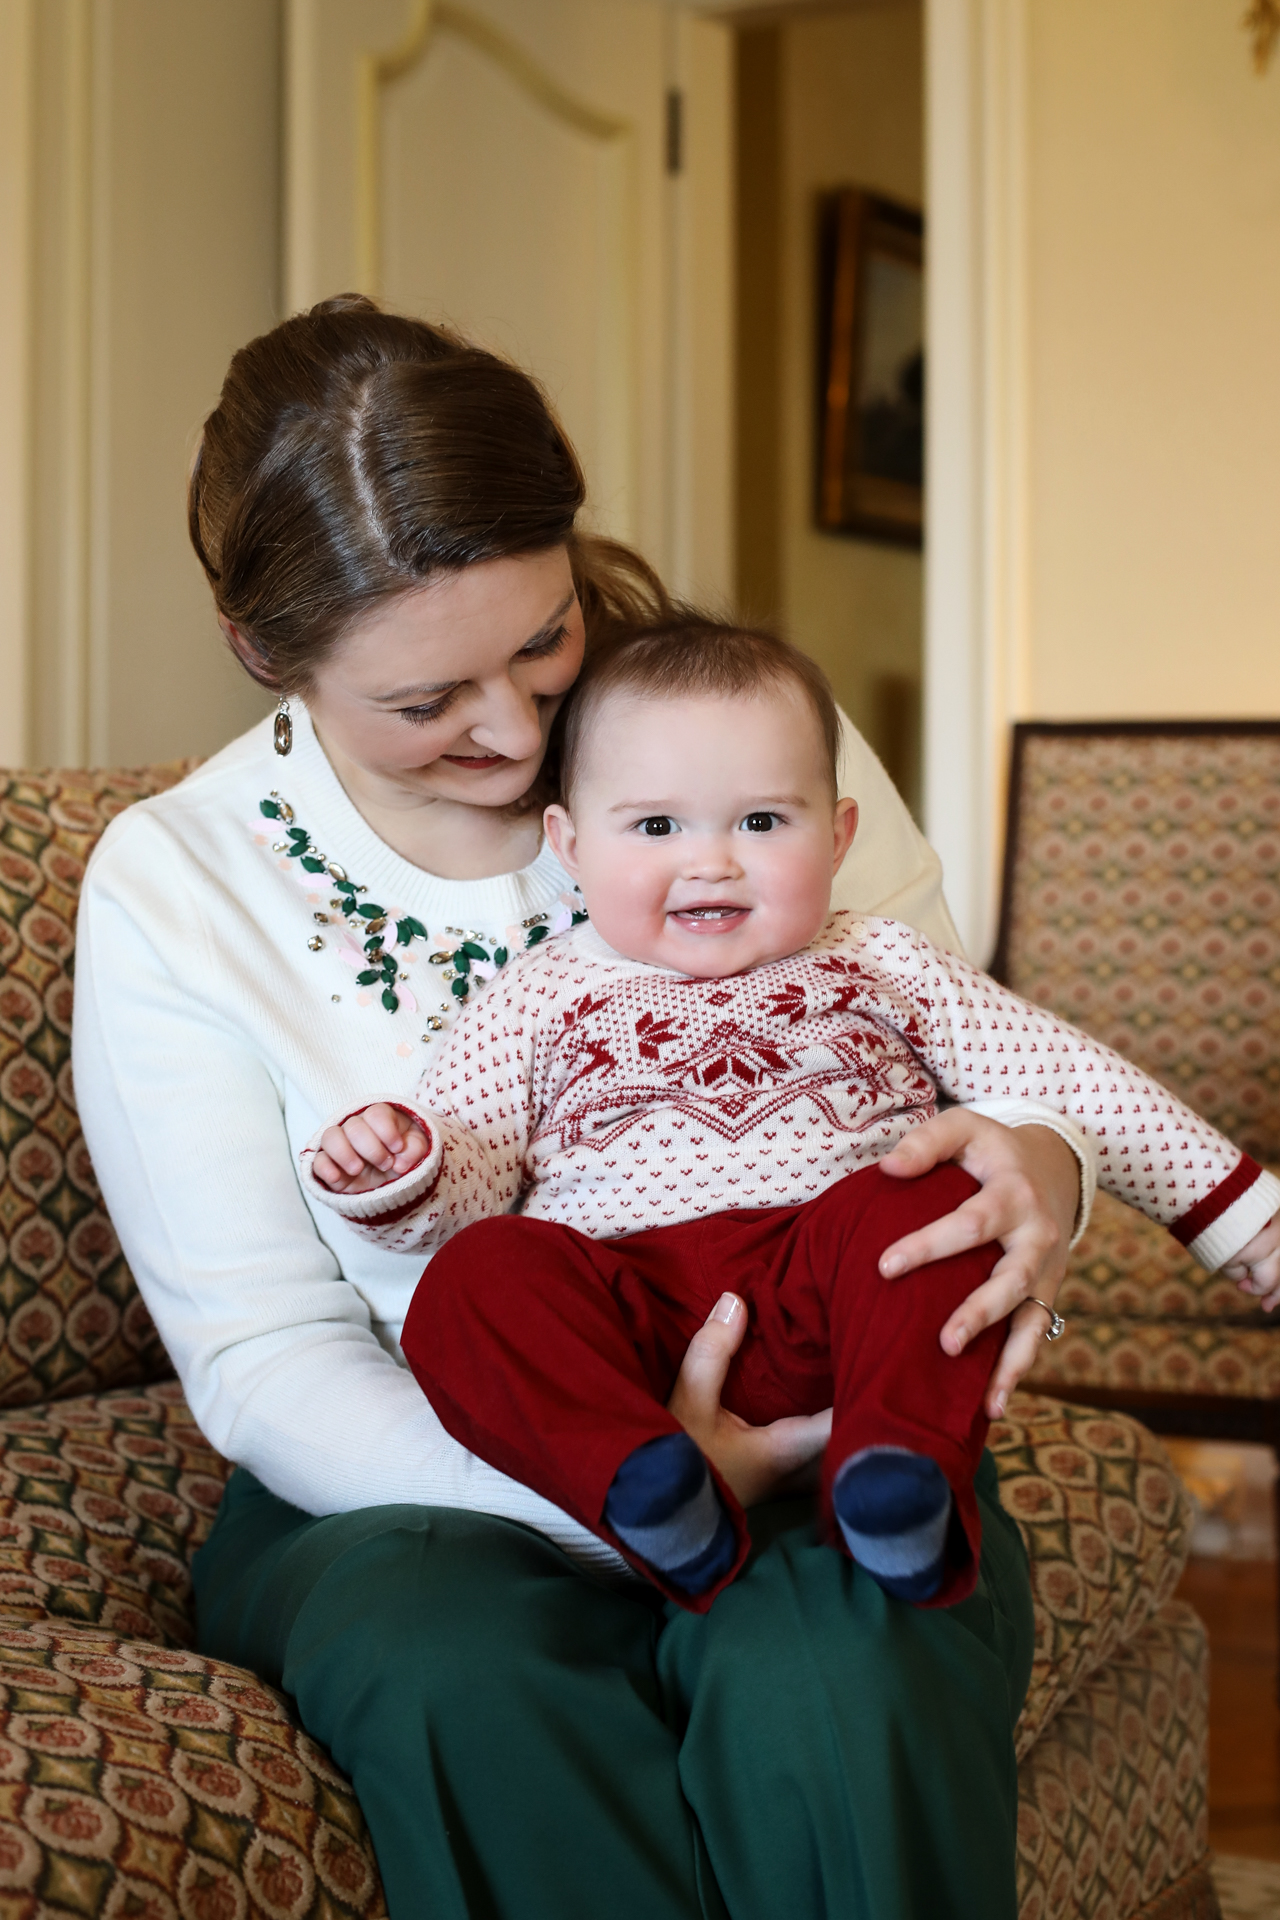 Cute Prince Charles and Gorgeus Stephanie - Celebration of Grand Duchess 37th Birthday